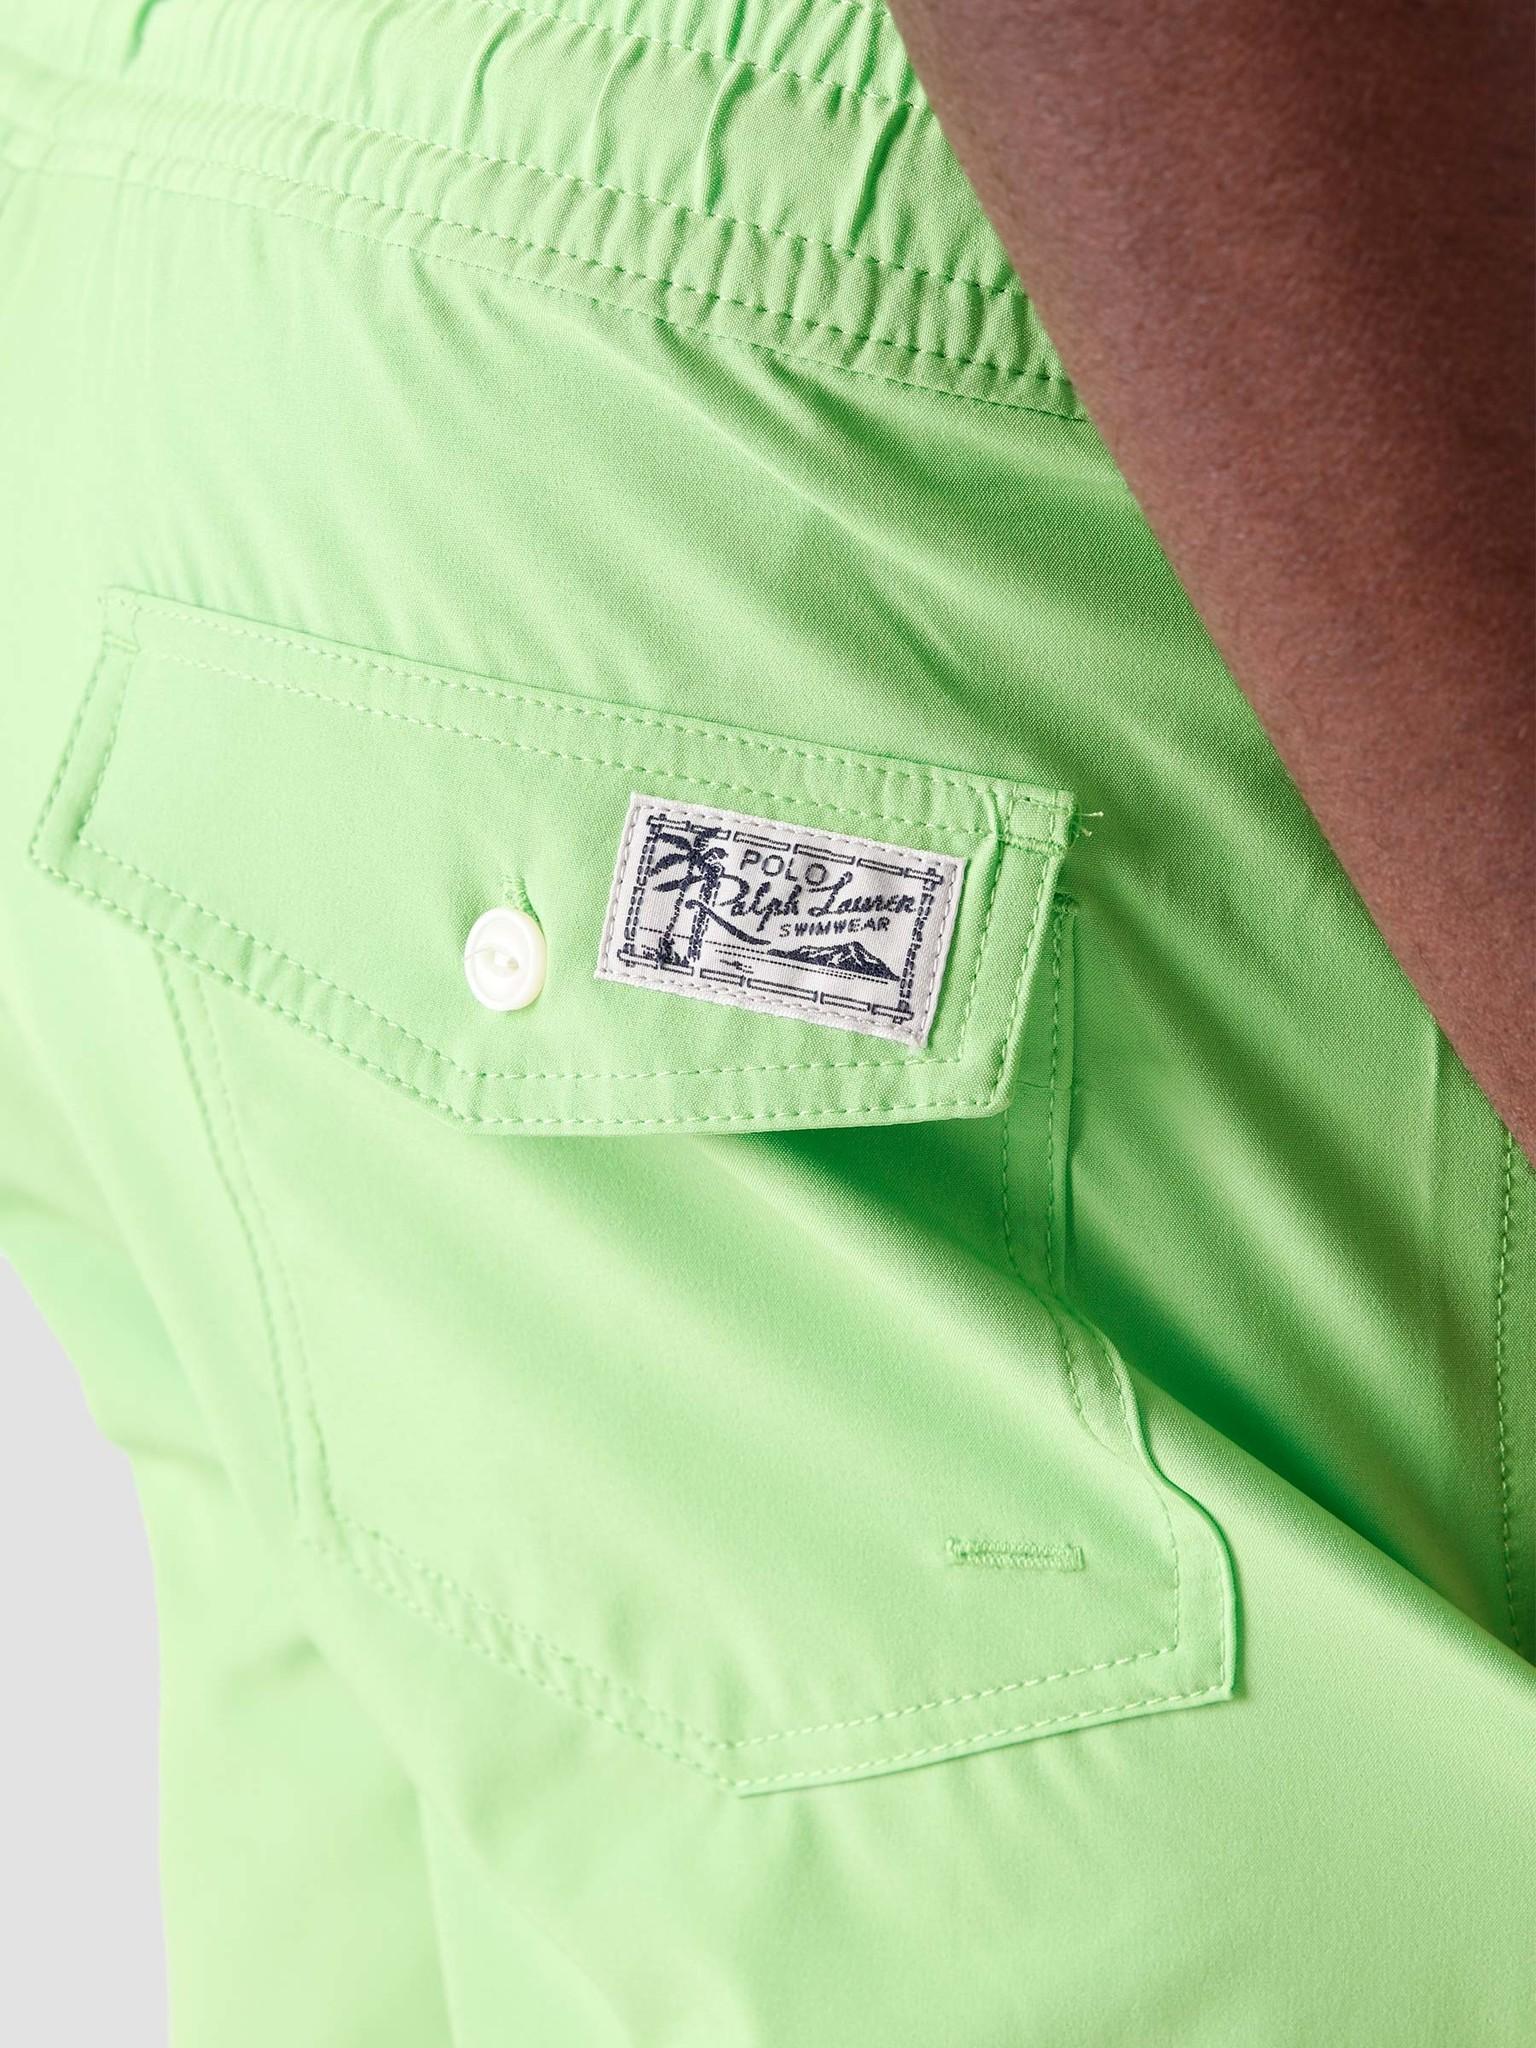 Polo Ralph Lauren Polo Ralph Lauren Recycled Polyester Traveler Short Kiwi Lime 710837404006